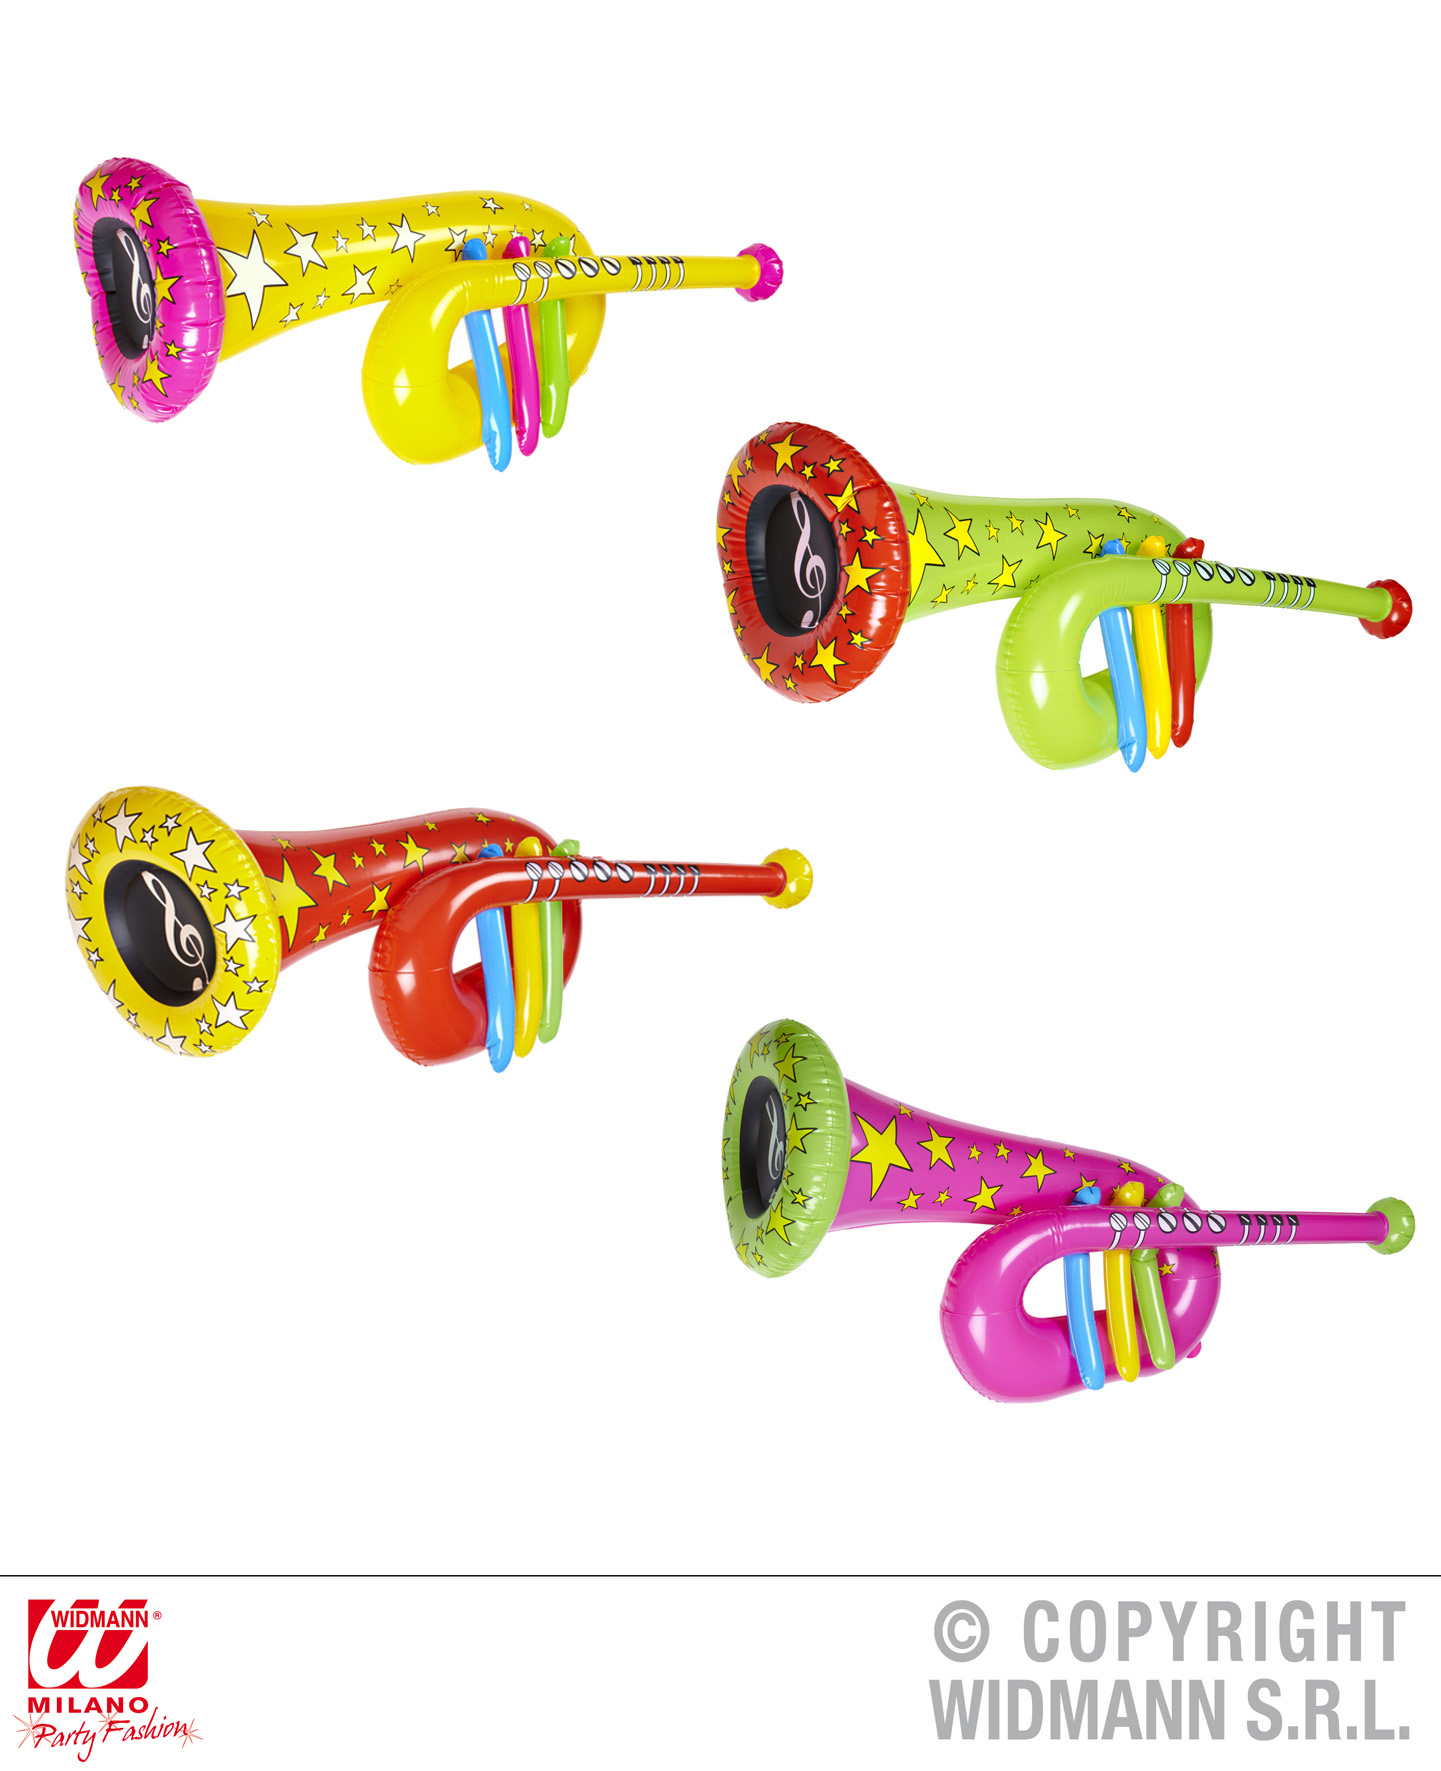 TUBA aufblasbar ca. 63 cm, Clown, Trompete, gelb,grün,rot,pink